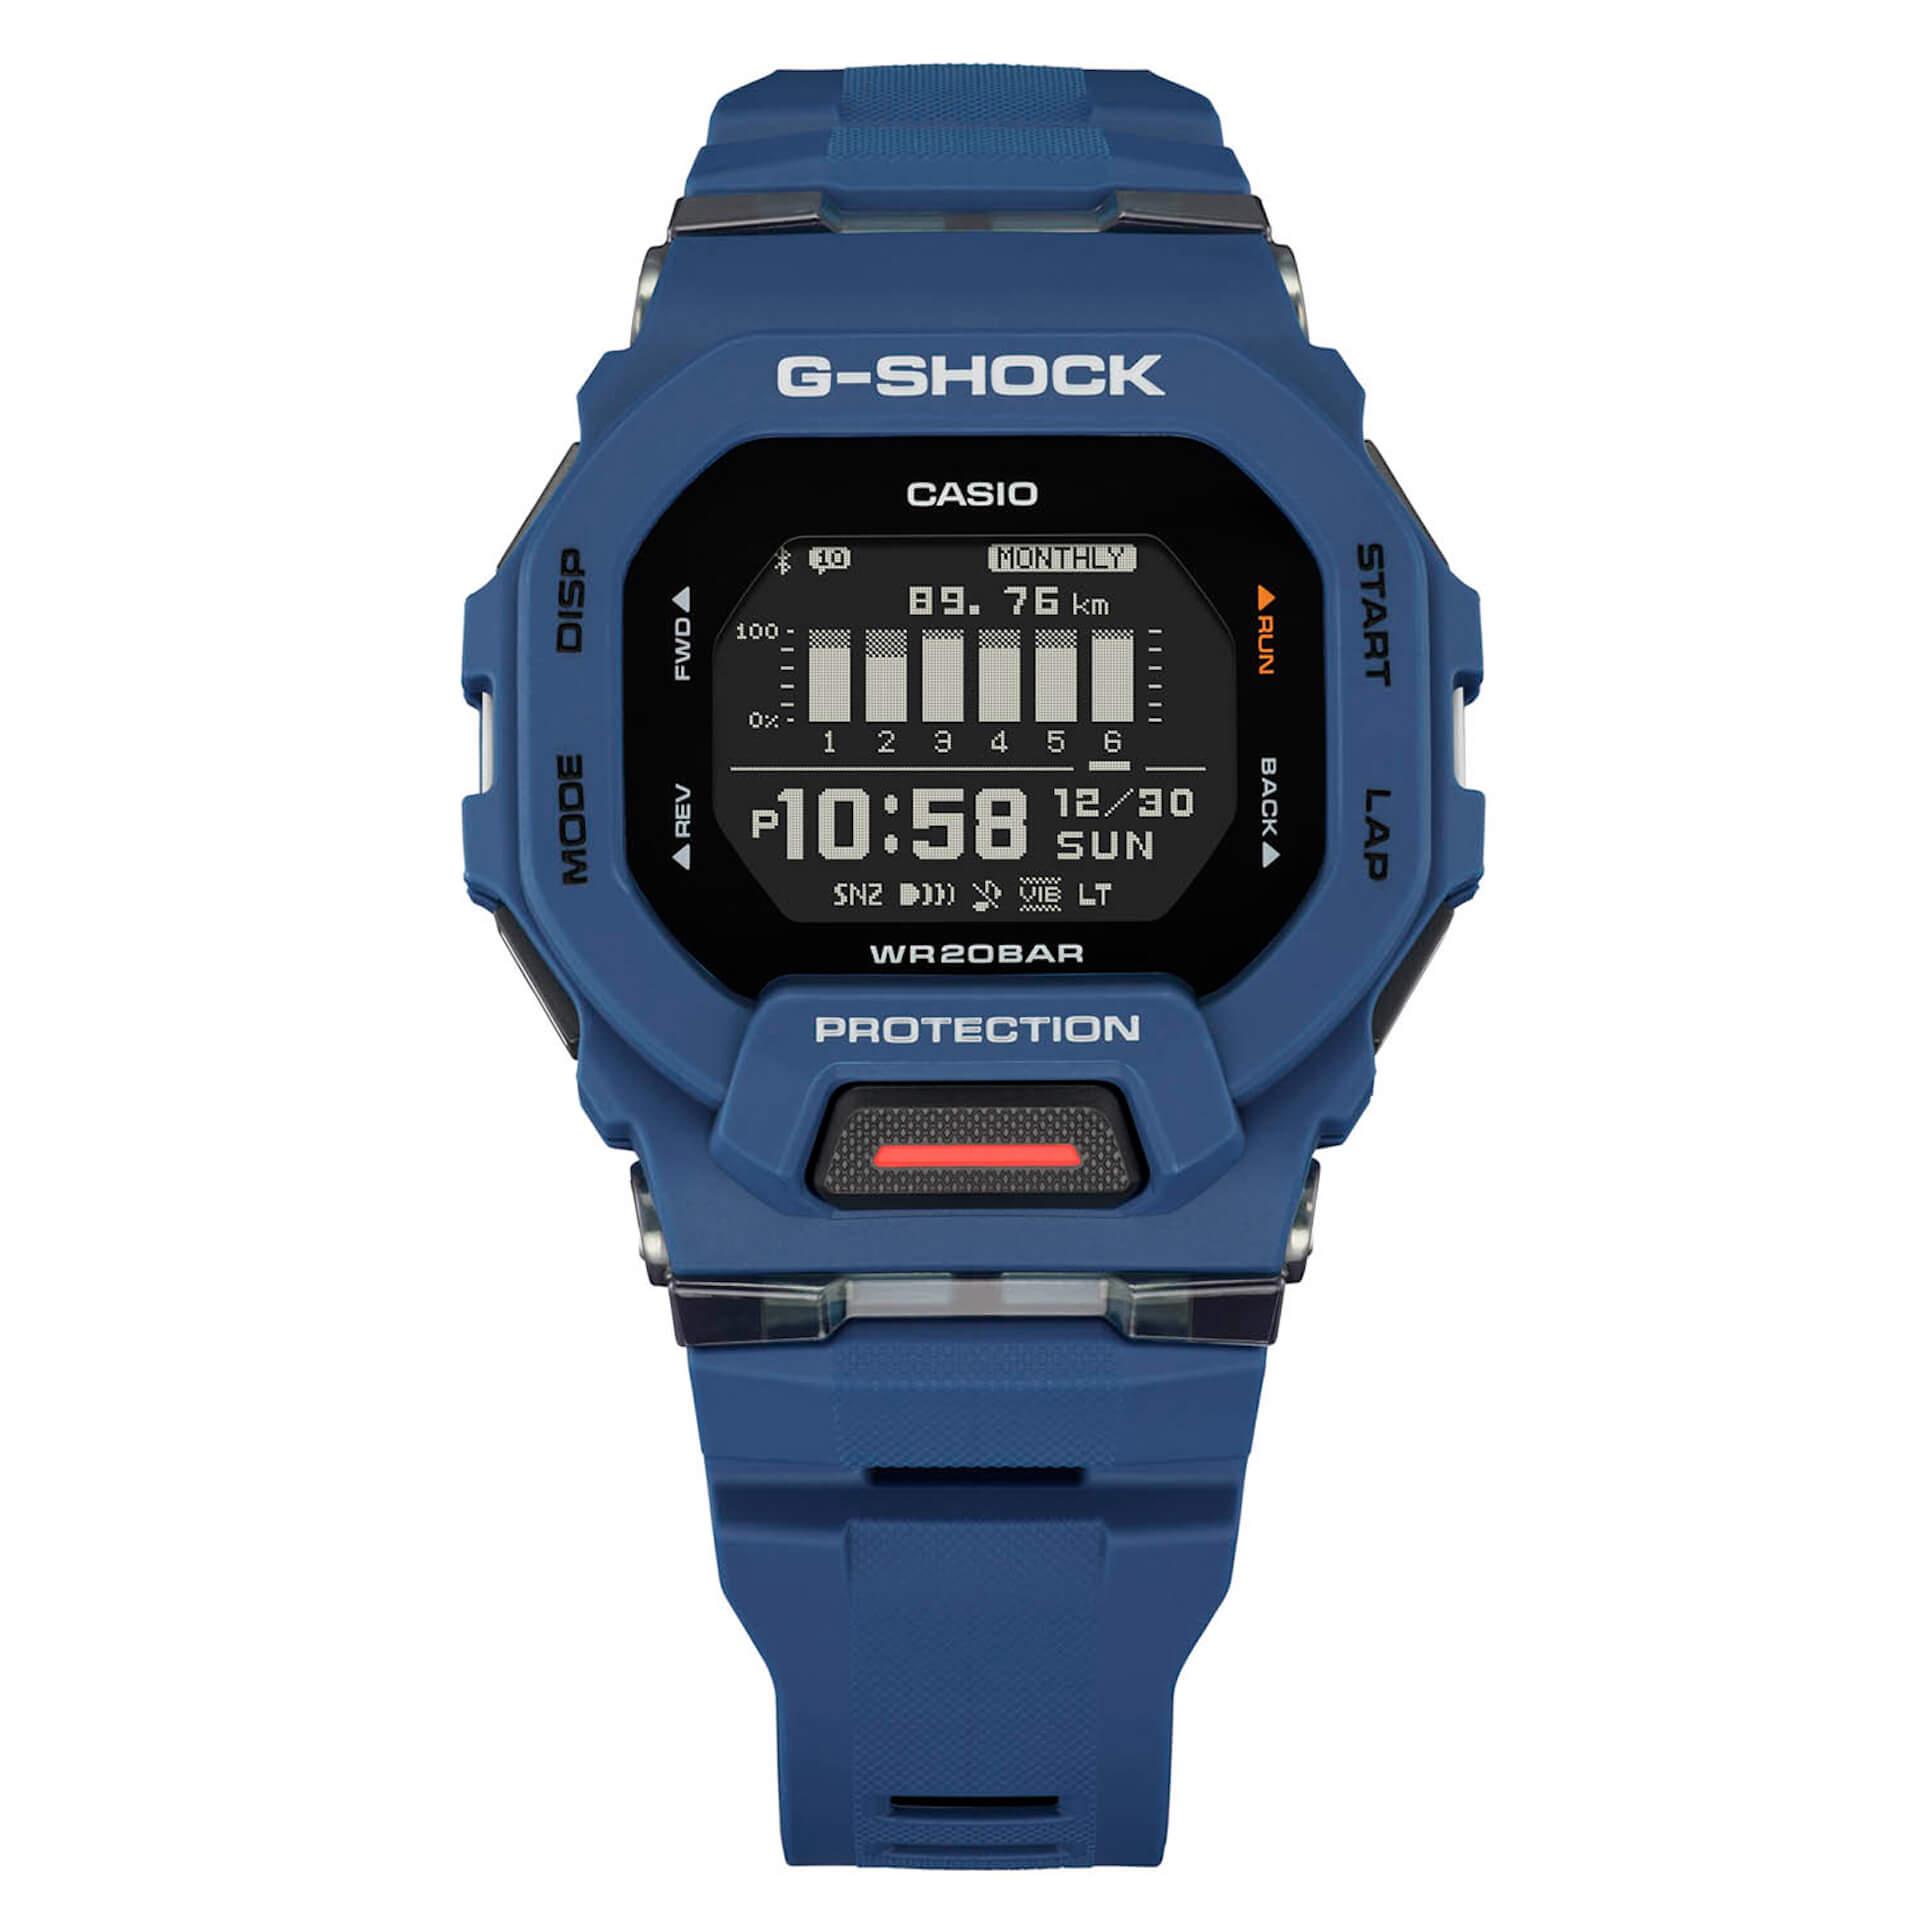 G-SHOCK「G-SQUAD」の角型ケース採用モデルに新製品『GBD-200』が登場! tech210615_gshock_gsquad_4